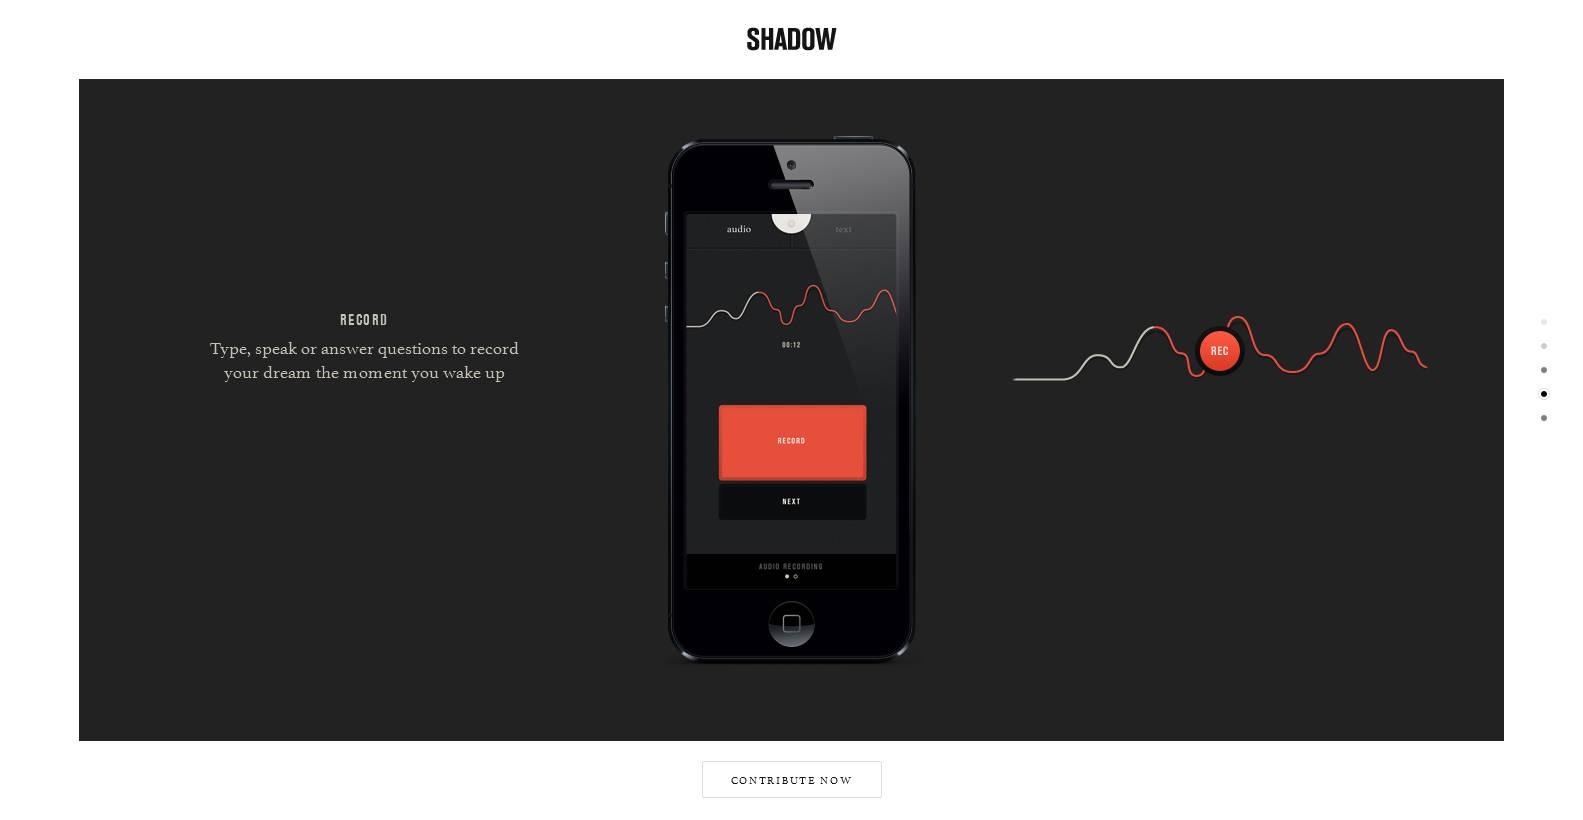 #1206 - 'SHADOW I Community of Dreamers' - discovershadow_com